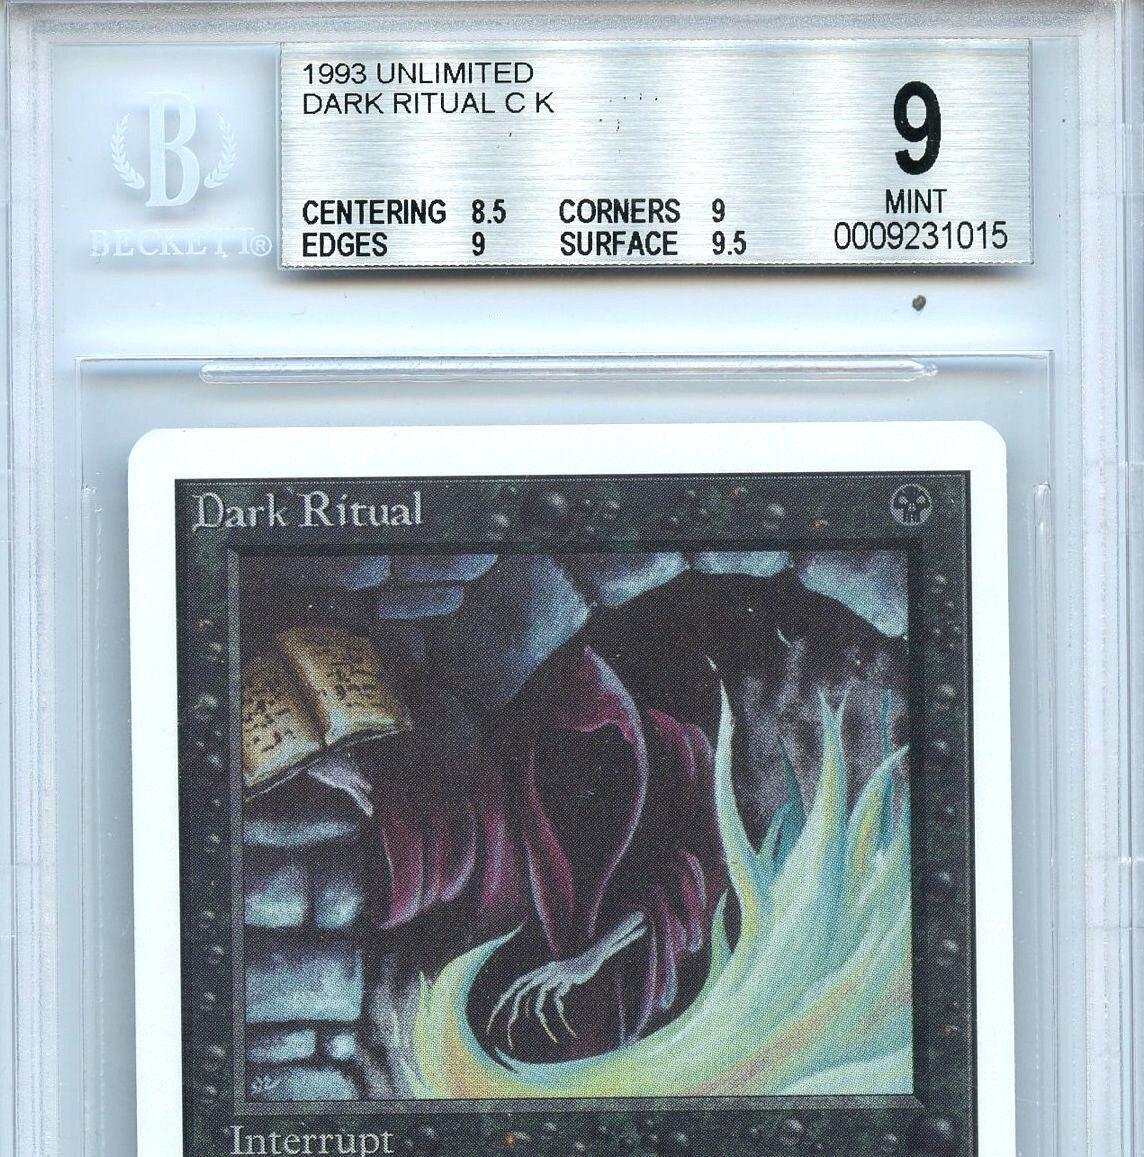 MTG Unlimited Dark Ritual Magic the Gathering Gathering Gathering WOTC BGS 9.0 (9) Mint Card 1015 ce516f